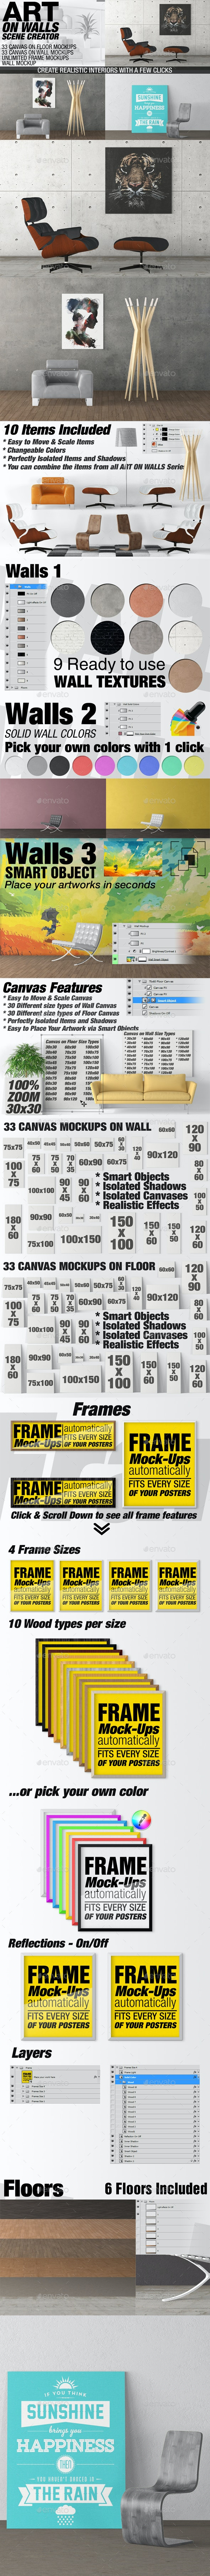 Art On Walls Mockup - Canvas Mockups - Frame Mockups - Wall Mockups Vol 10 - Miscellaneous Product Mock-Ups